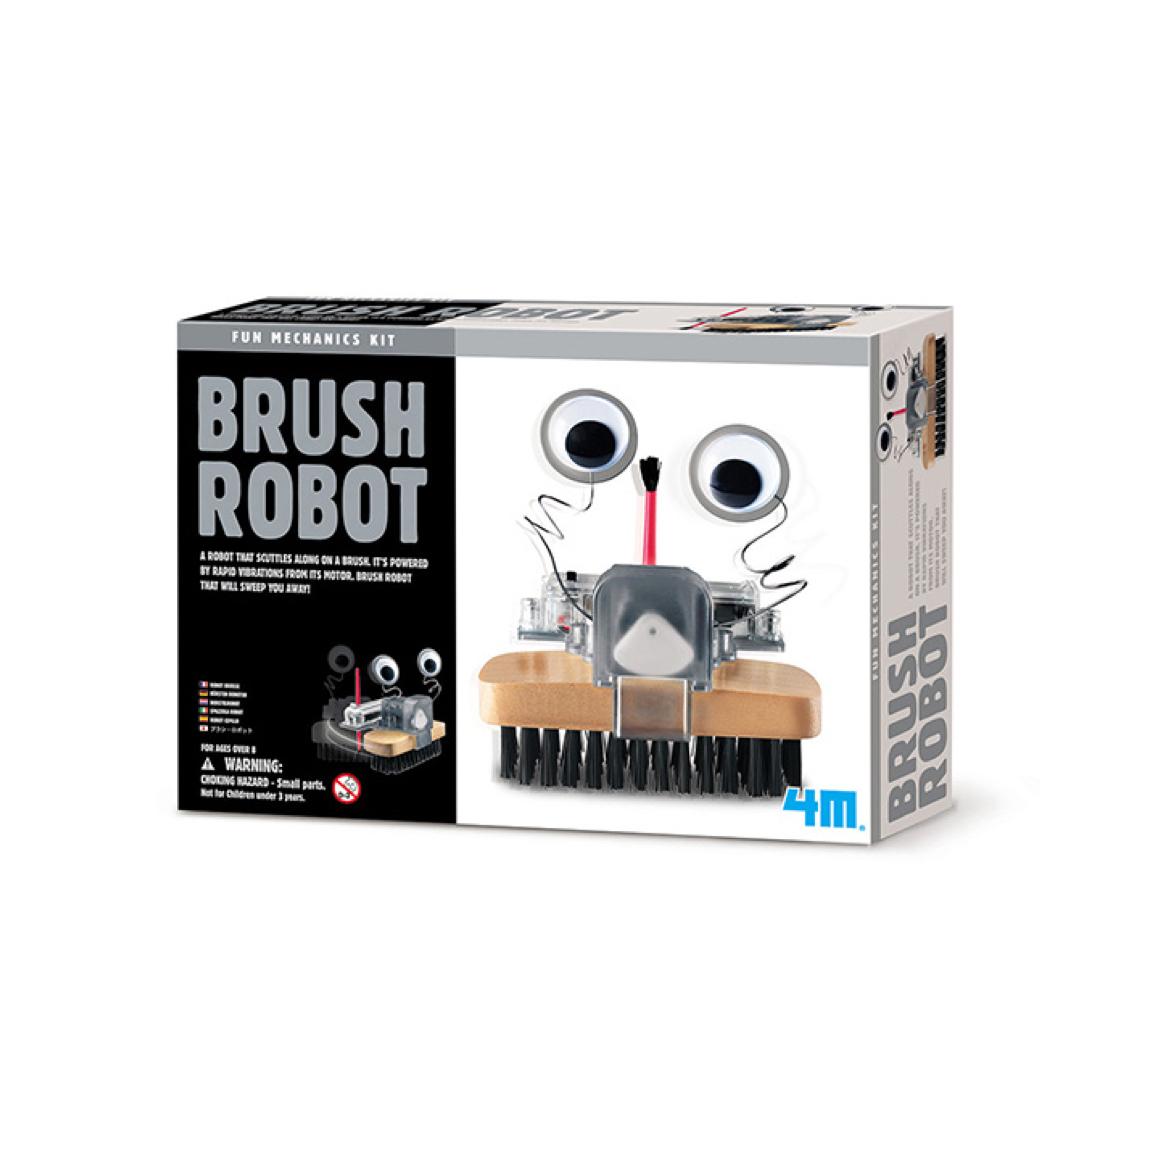 cepillo-robot-brush-robot-de-4m-en-el-mundo-de-mico